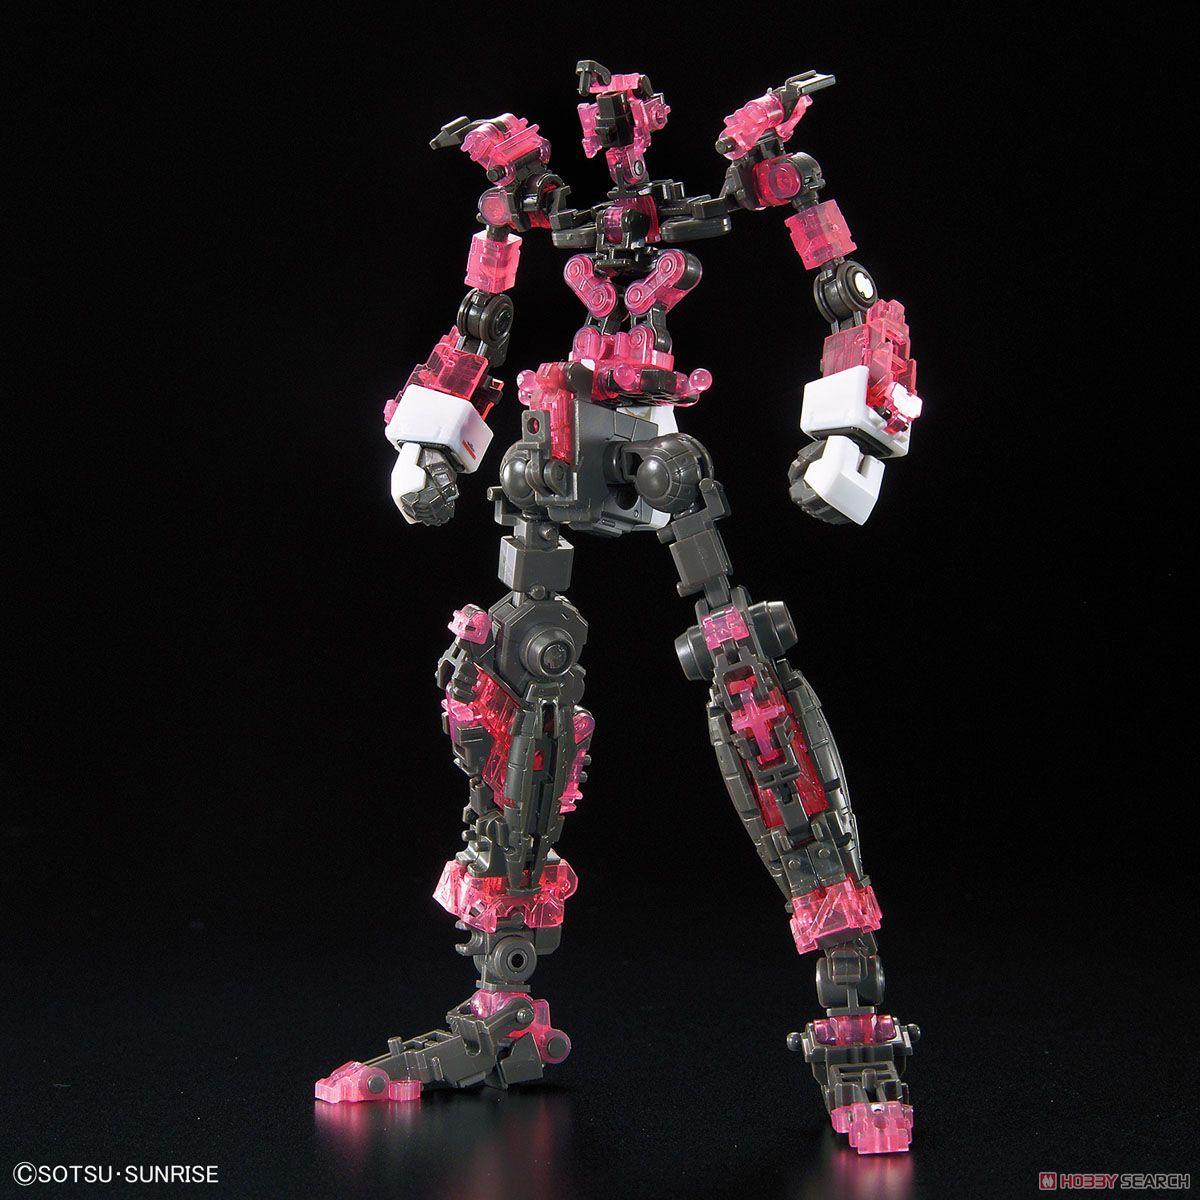 RX-0 Unicorn Gundam (RG) (Gundam Model Kits) Item picture14